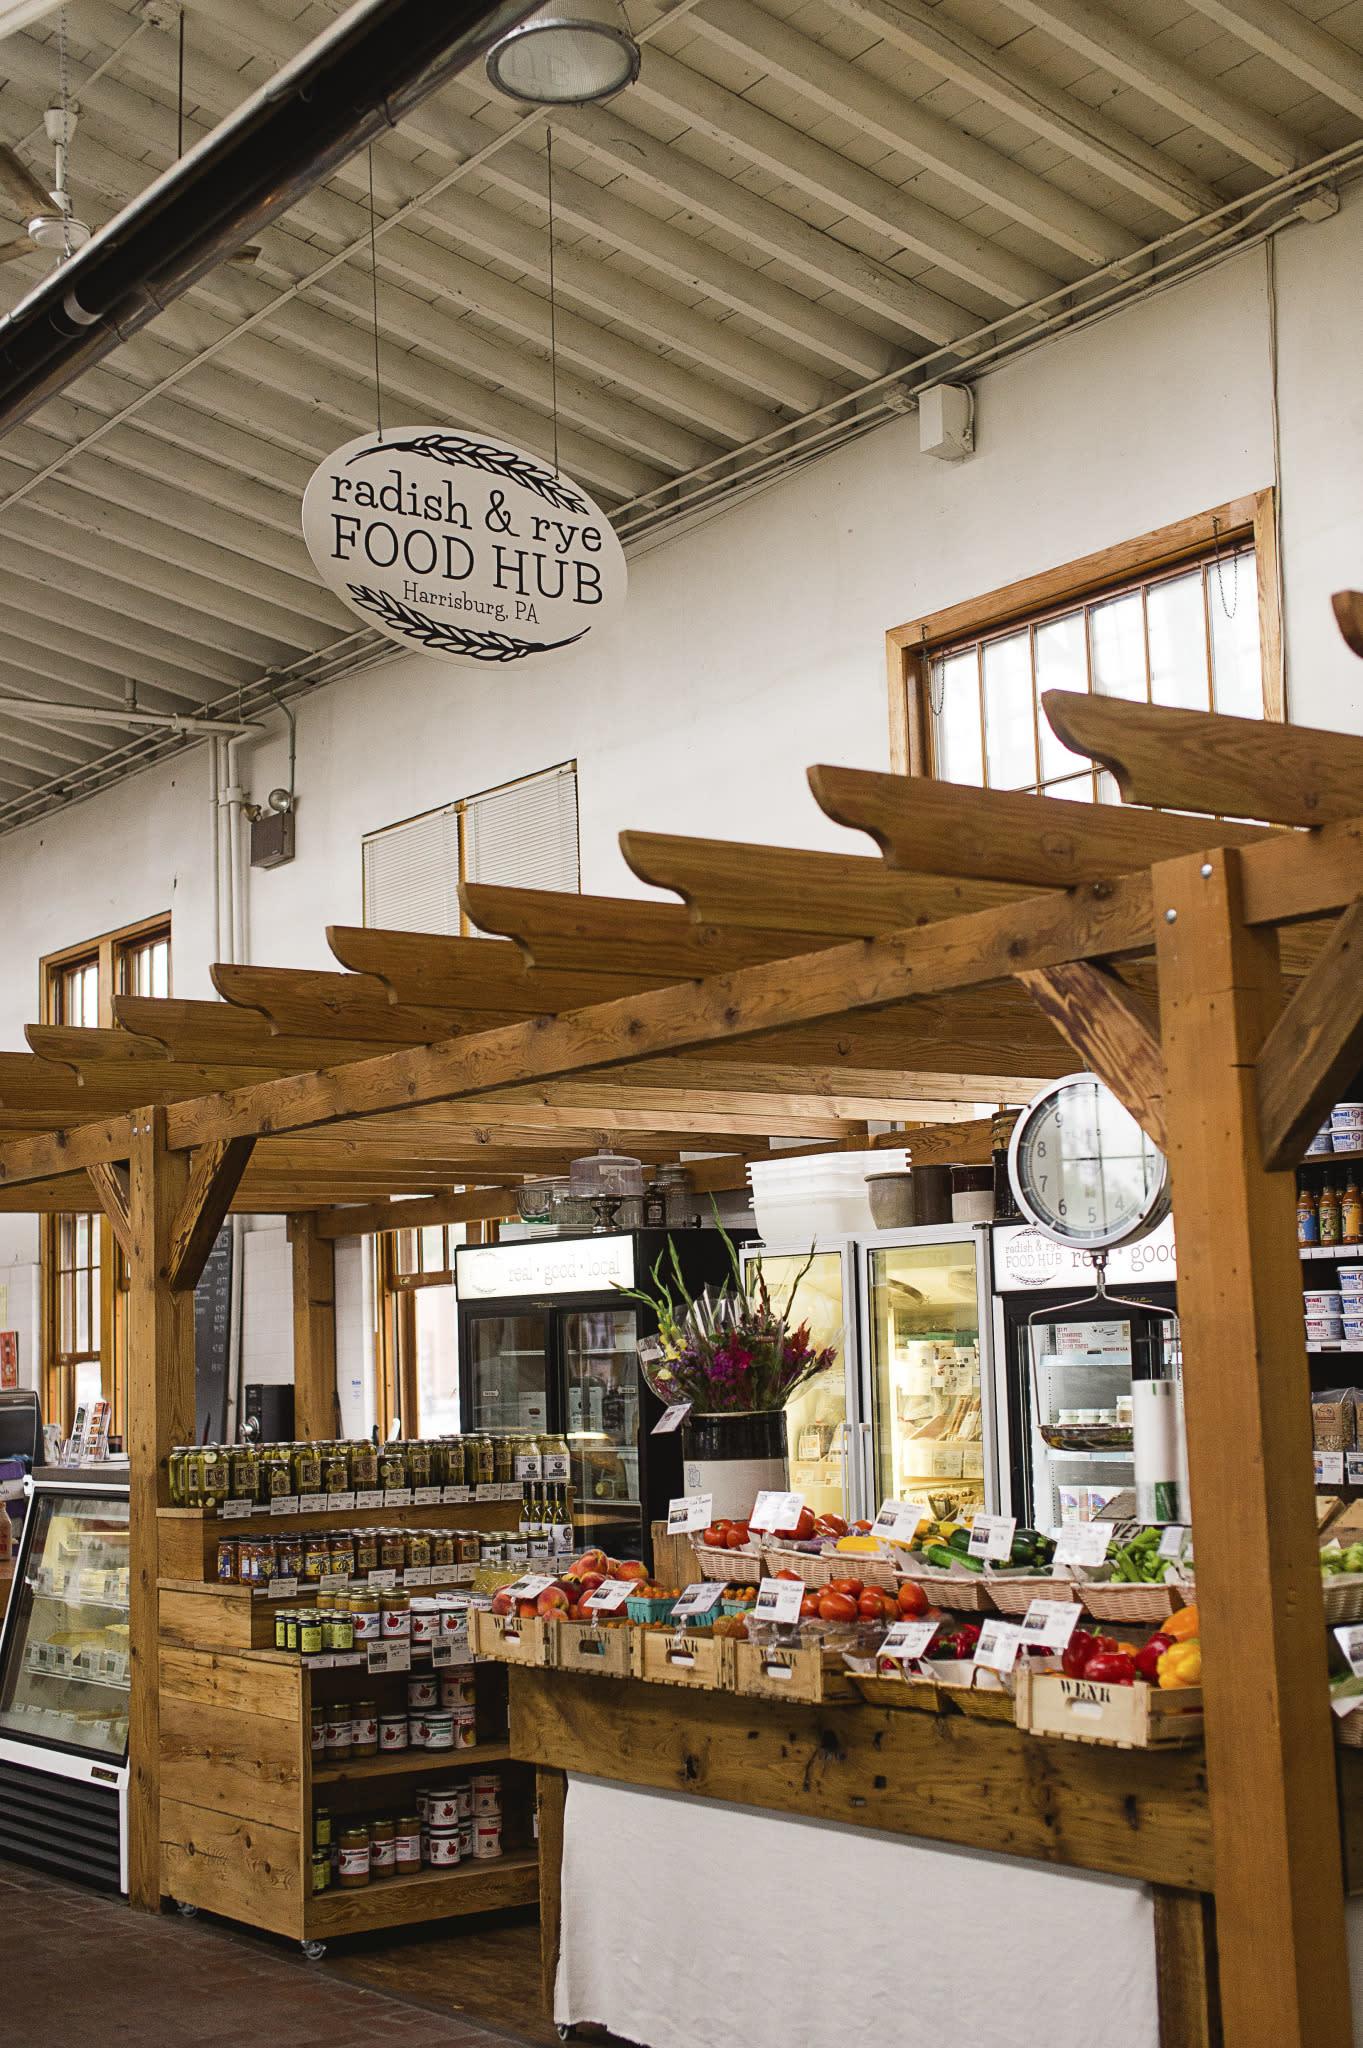 Radish & Rye Food Hub